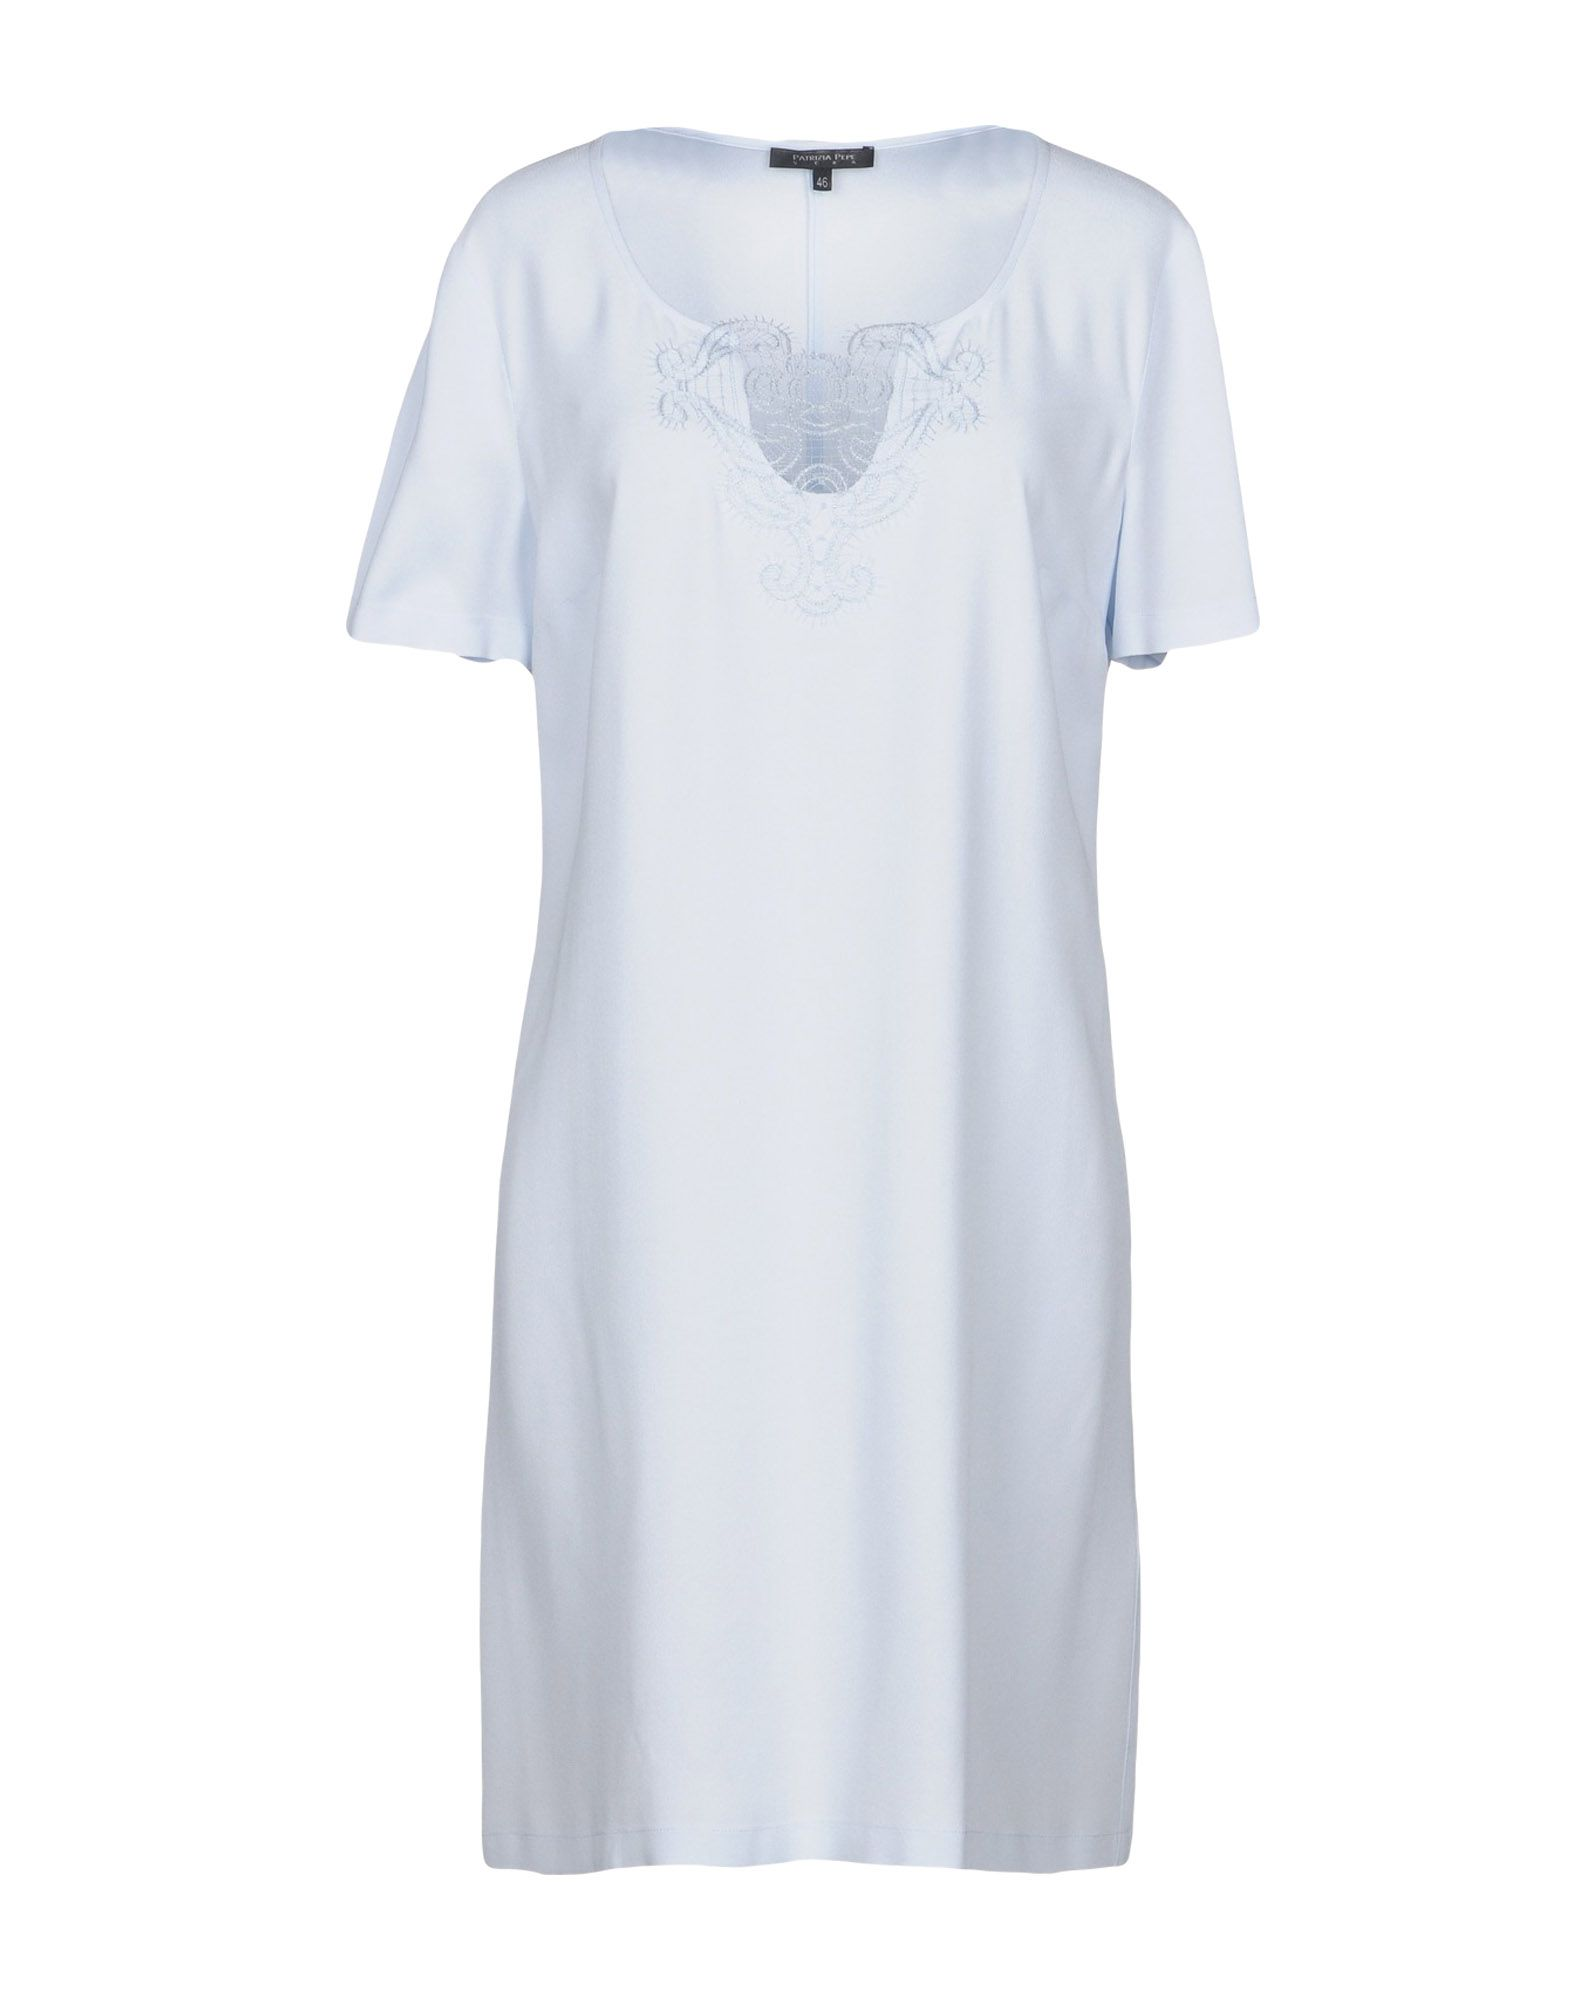 PATRIZIA PEPE Короткое платье платье patrizia pepe patrizia pepe pa748ewptm91